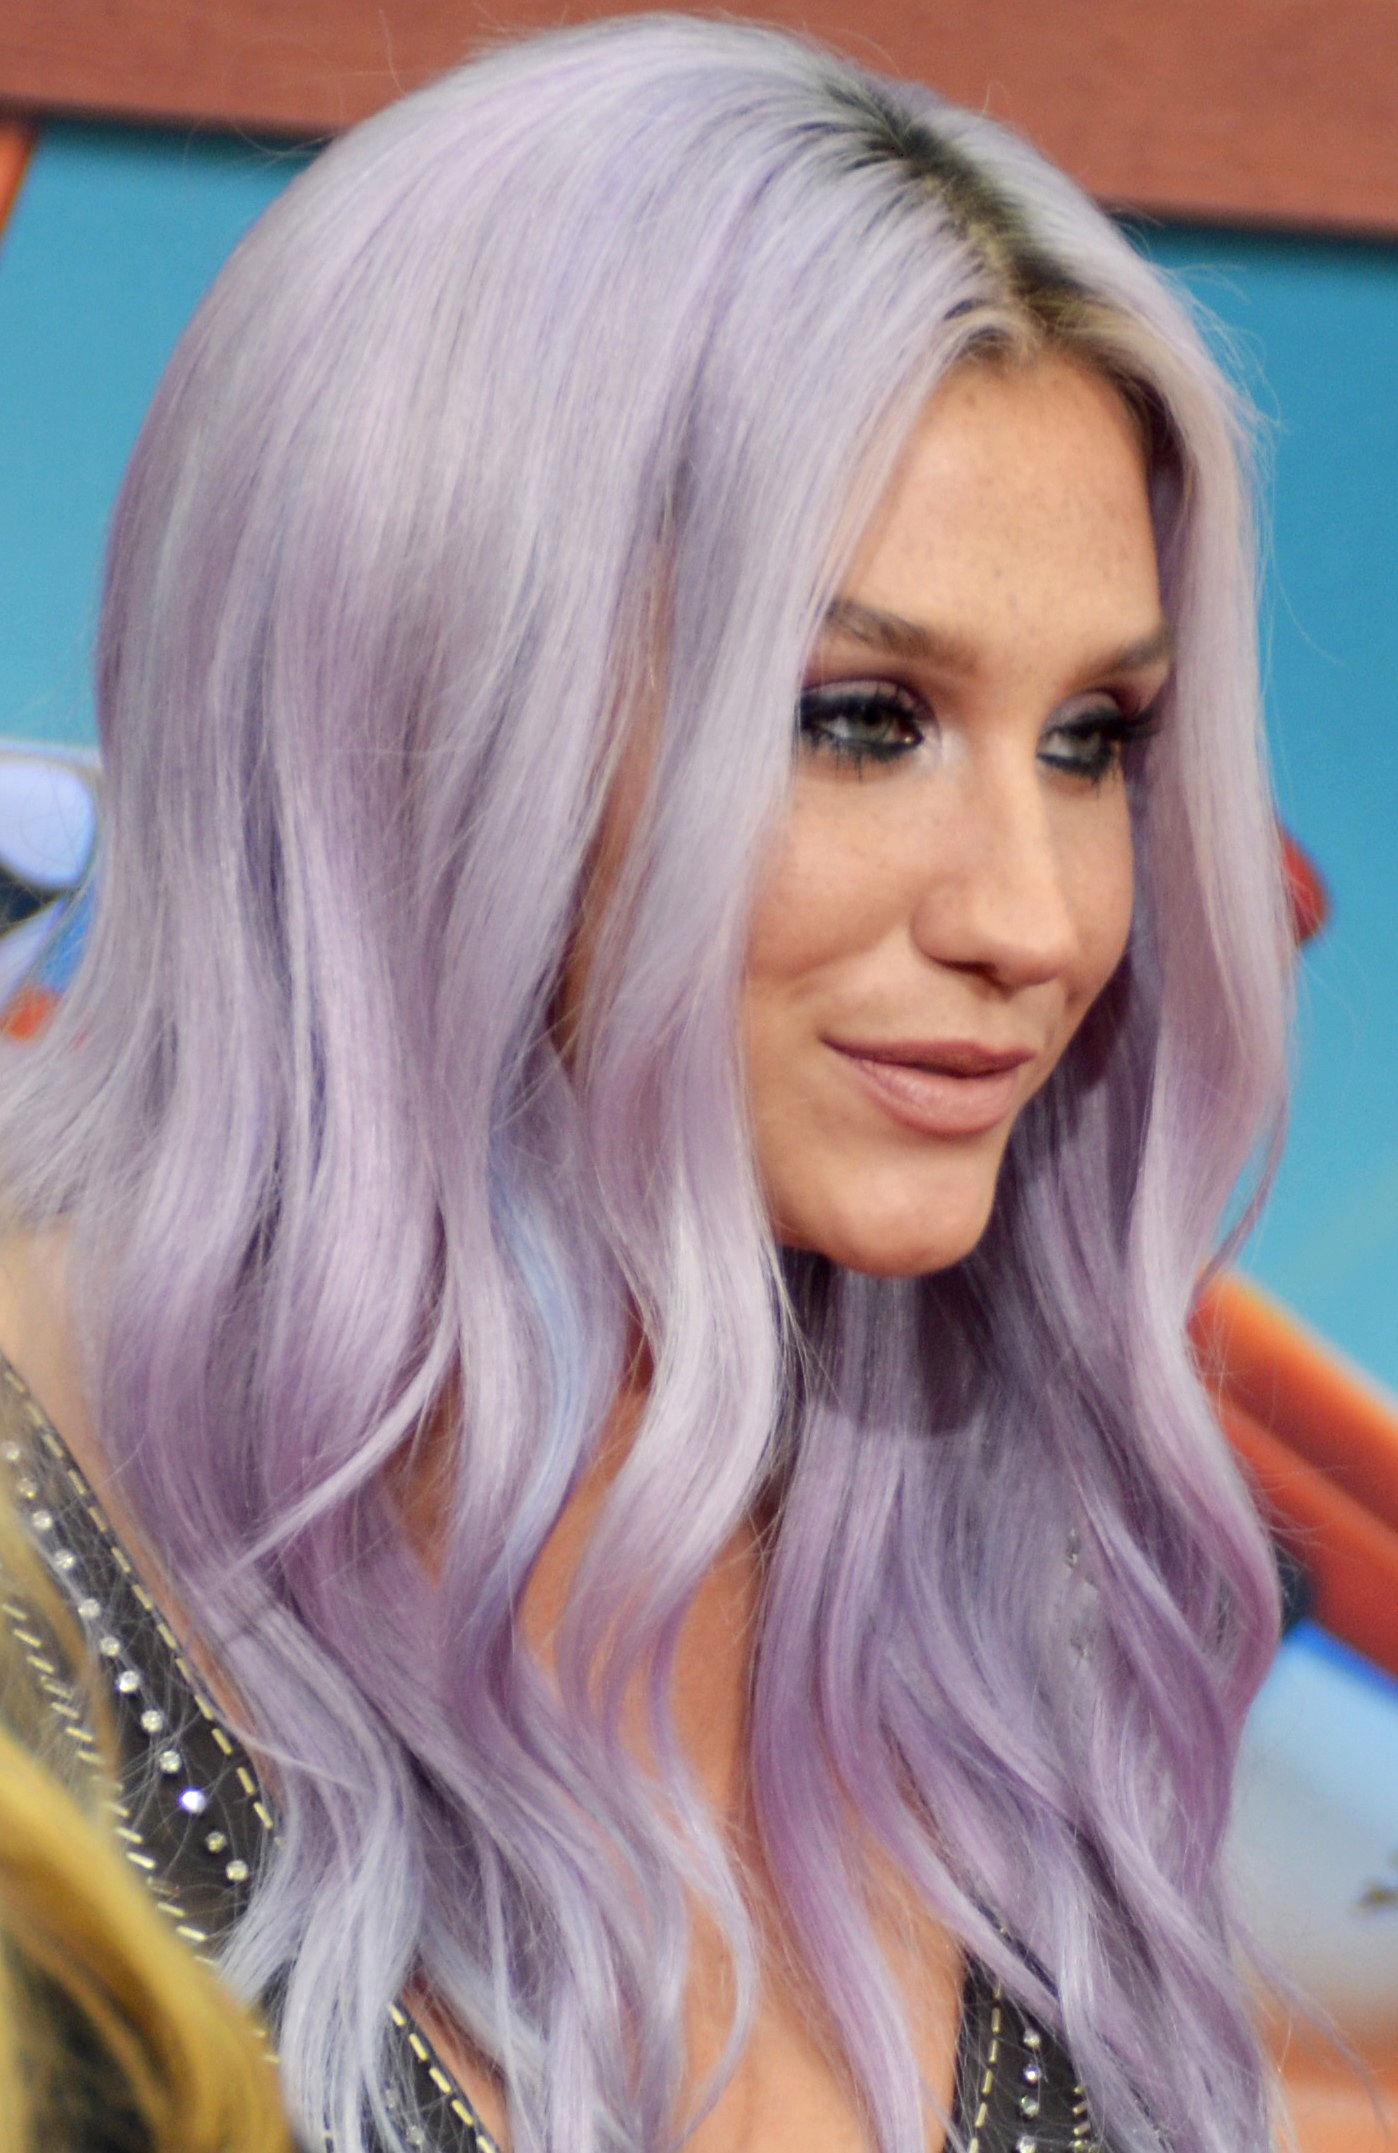 Photo of Kesha: American singer-songwriter